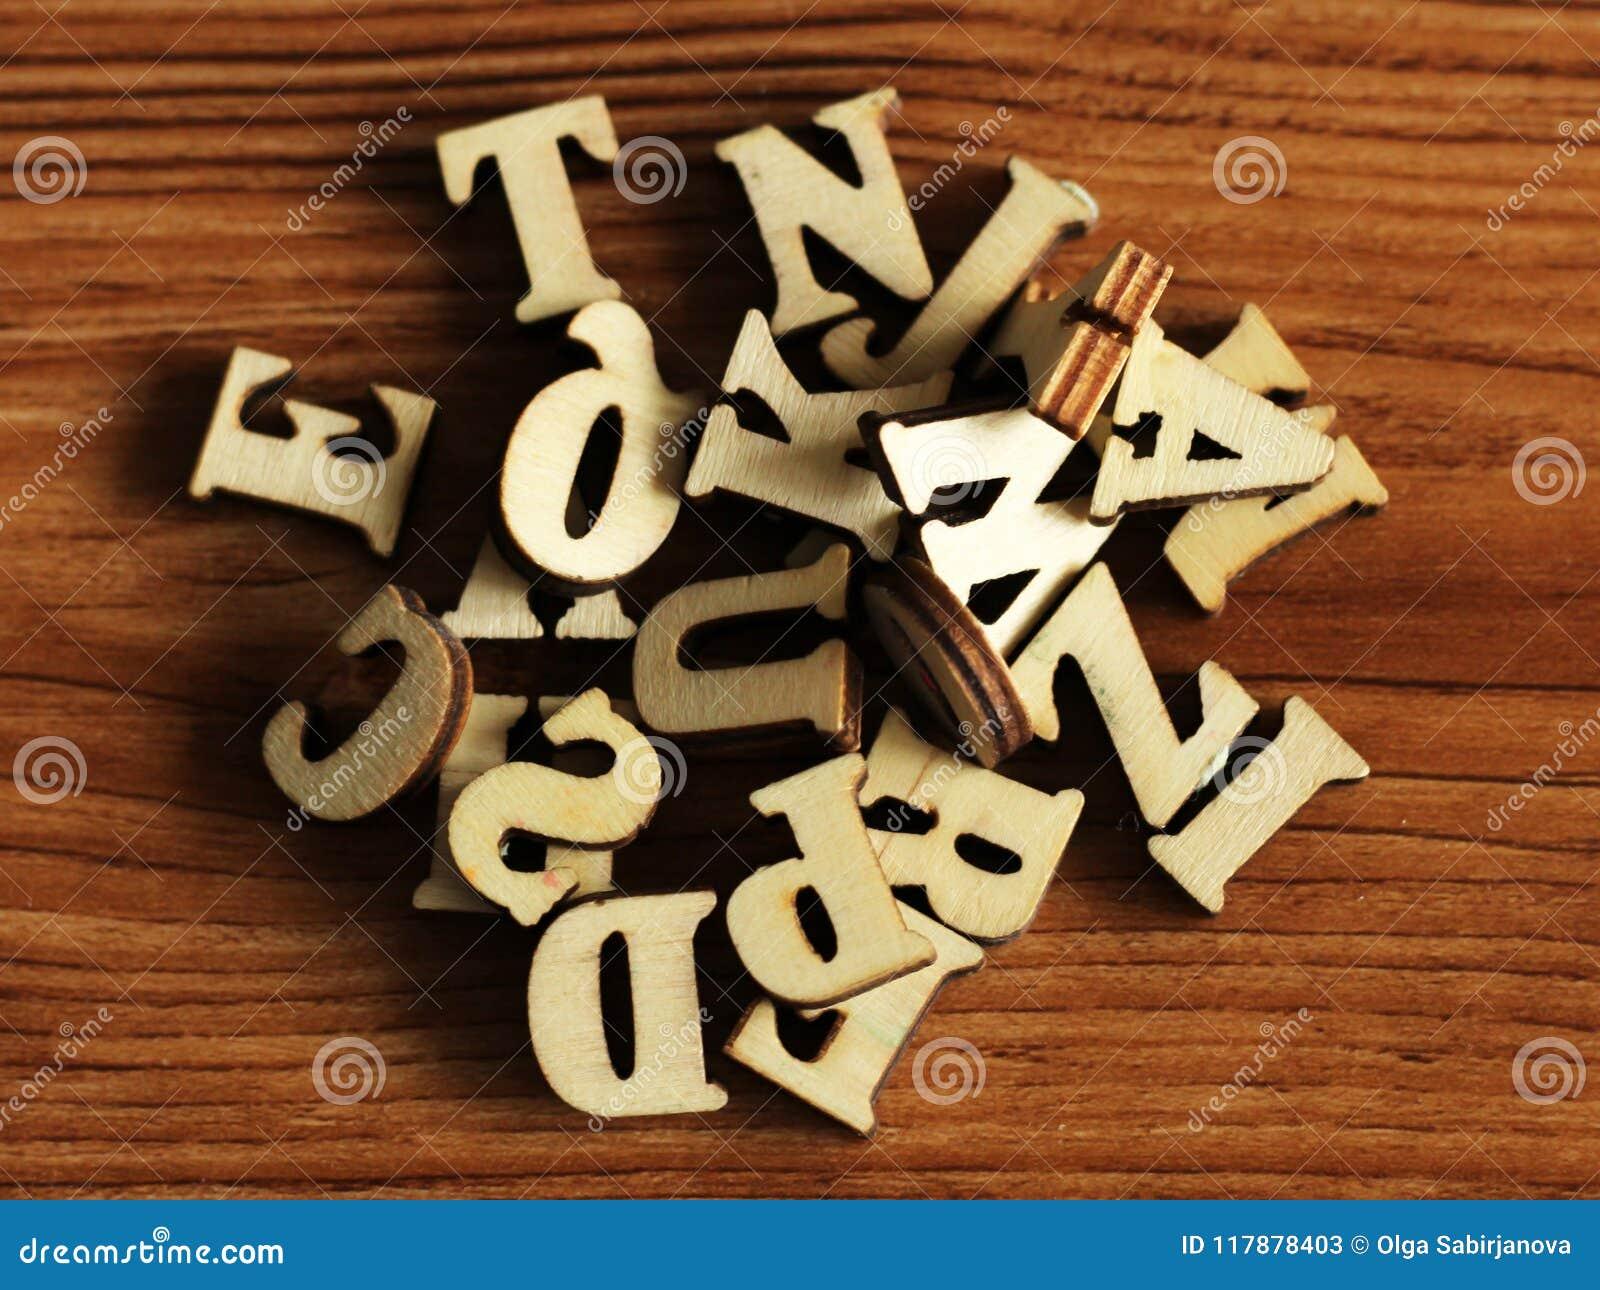 Wandplank Retro Cubes.Wooden Alphabet Letters So Close Stock Image Image Of Plank Retro